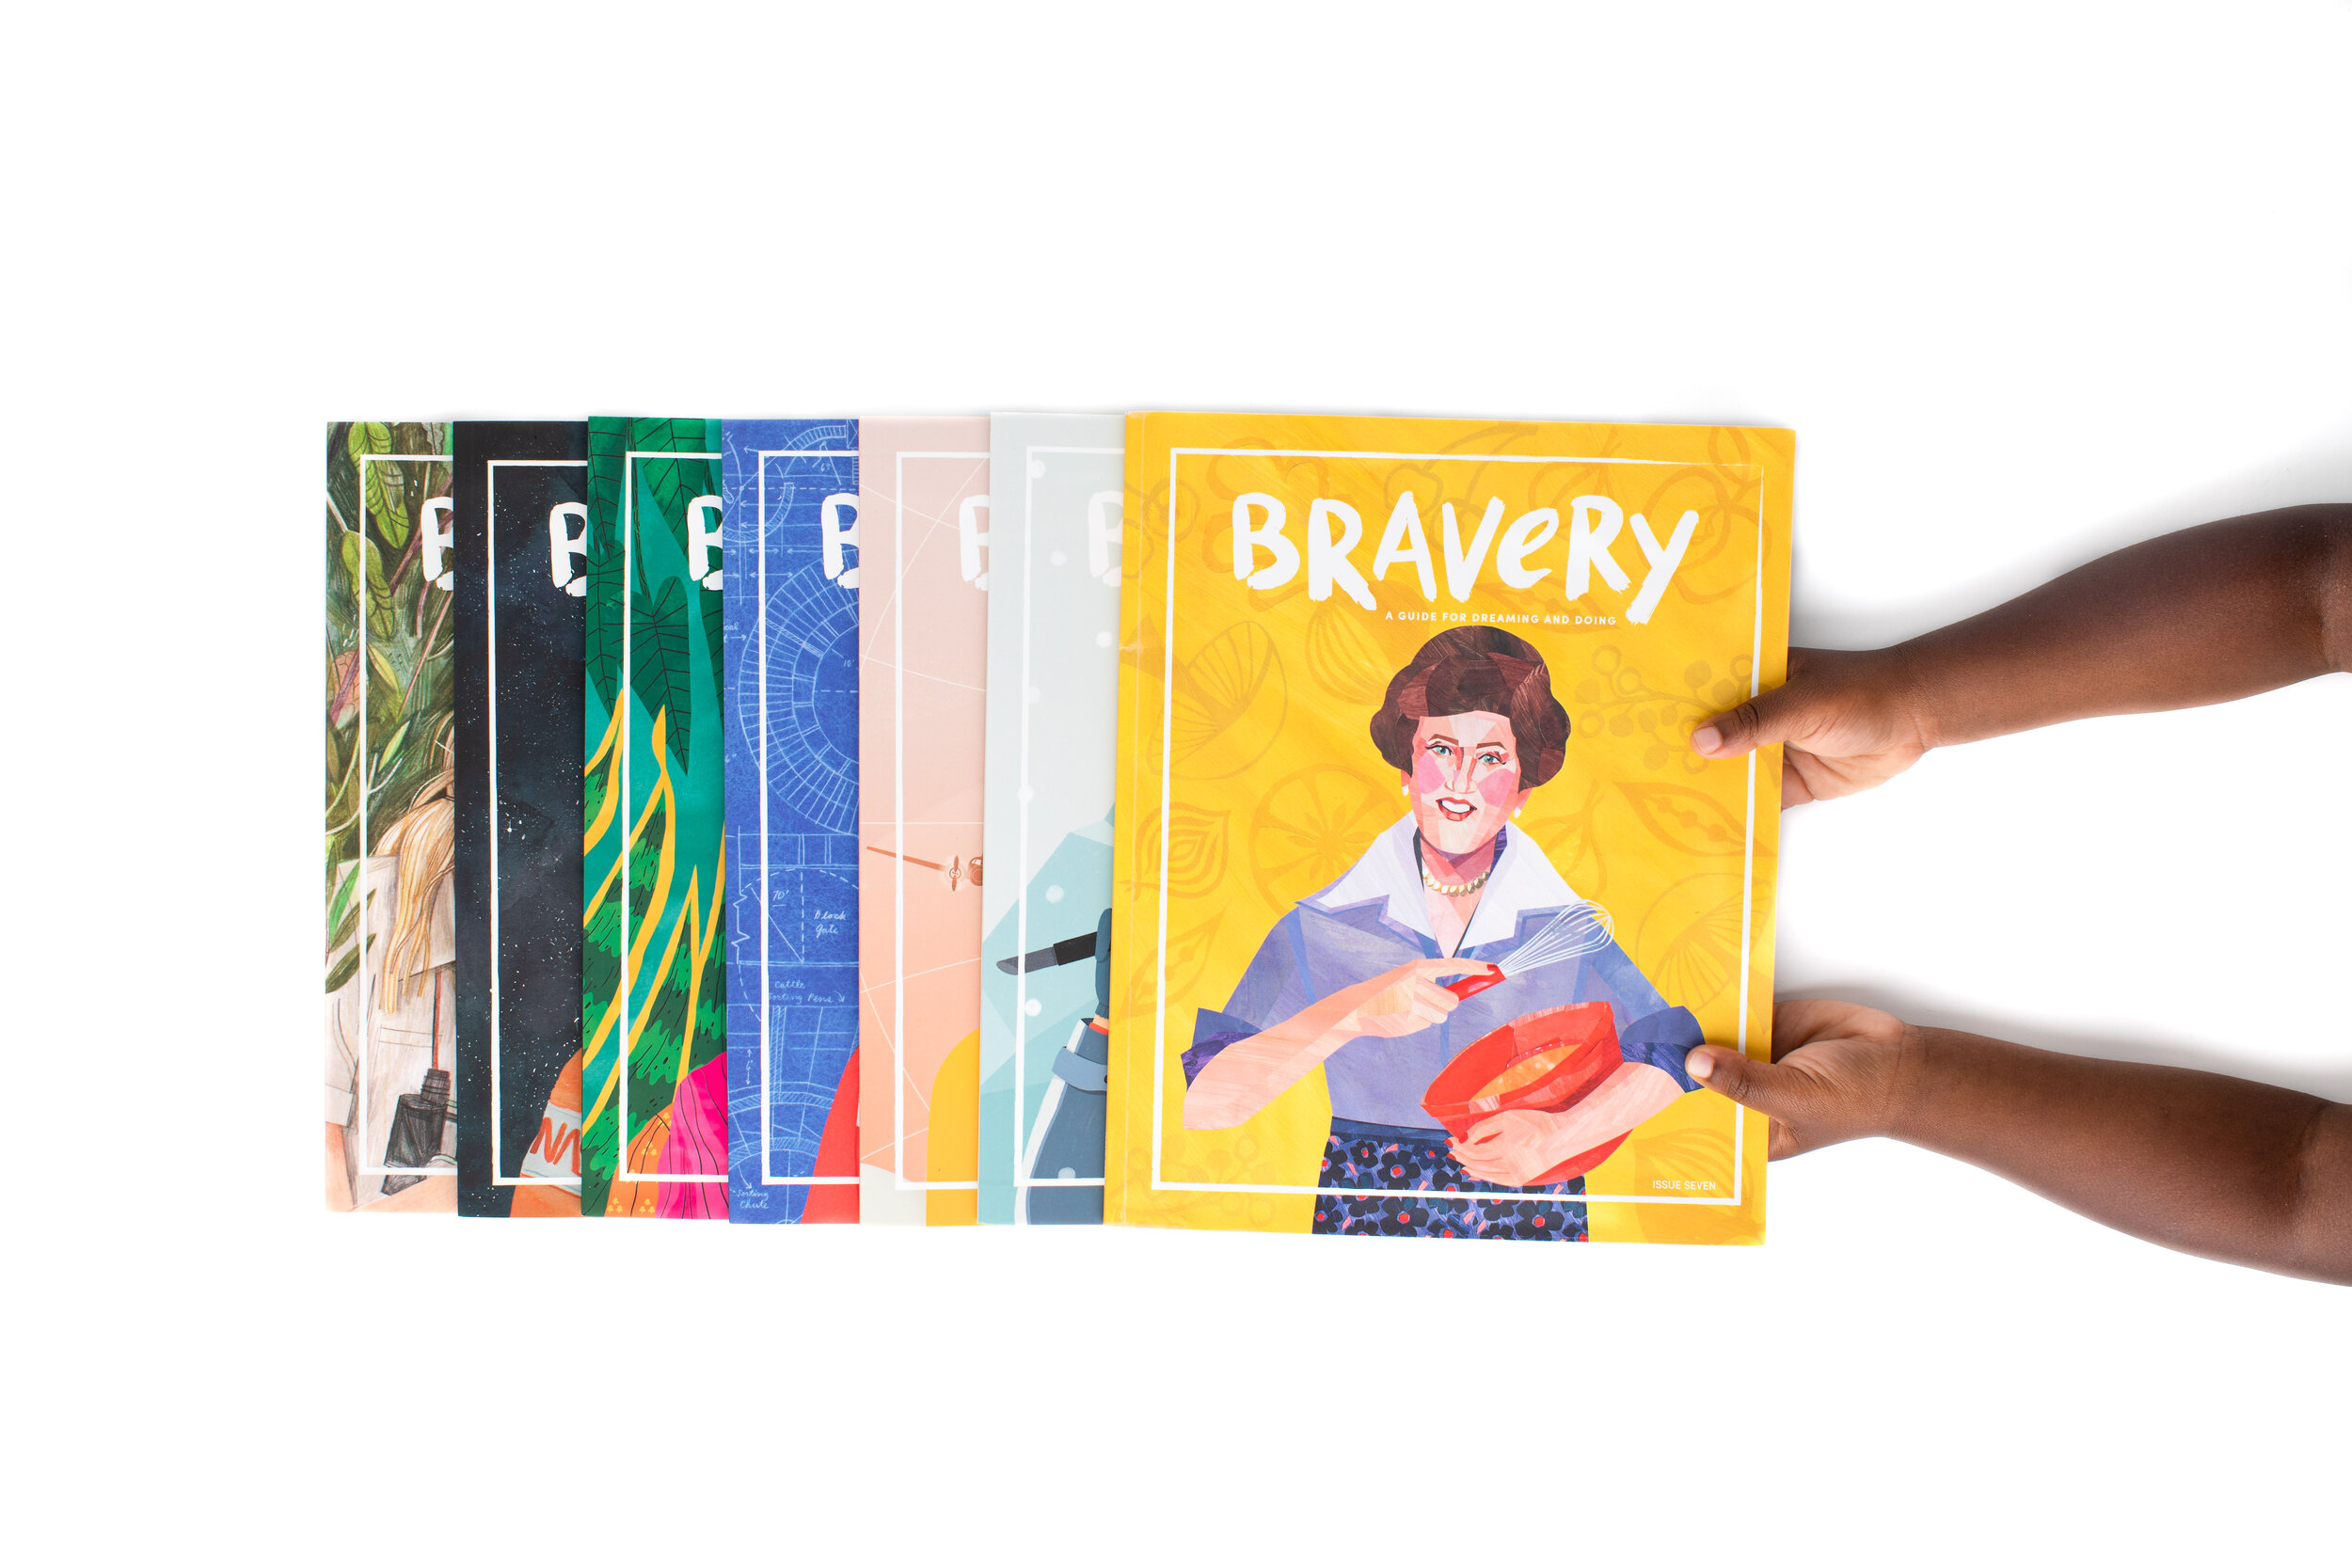 Bravery-Mag-Product-Shoot-Kimberly-Murray-01 (1).jpg